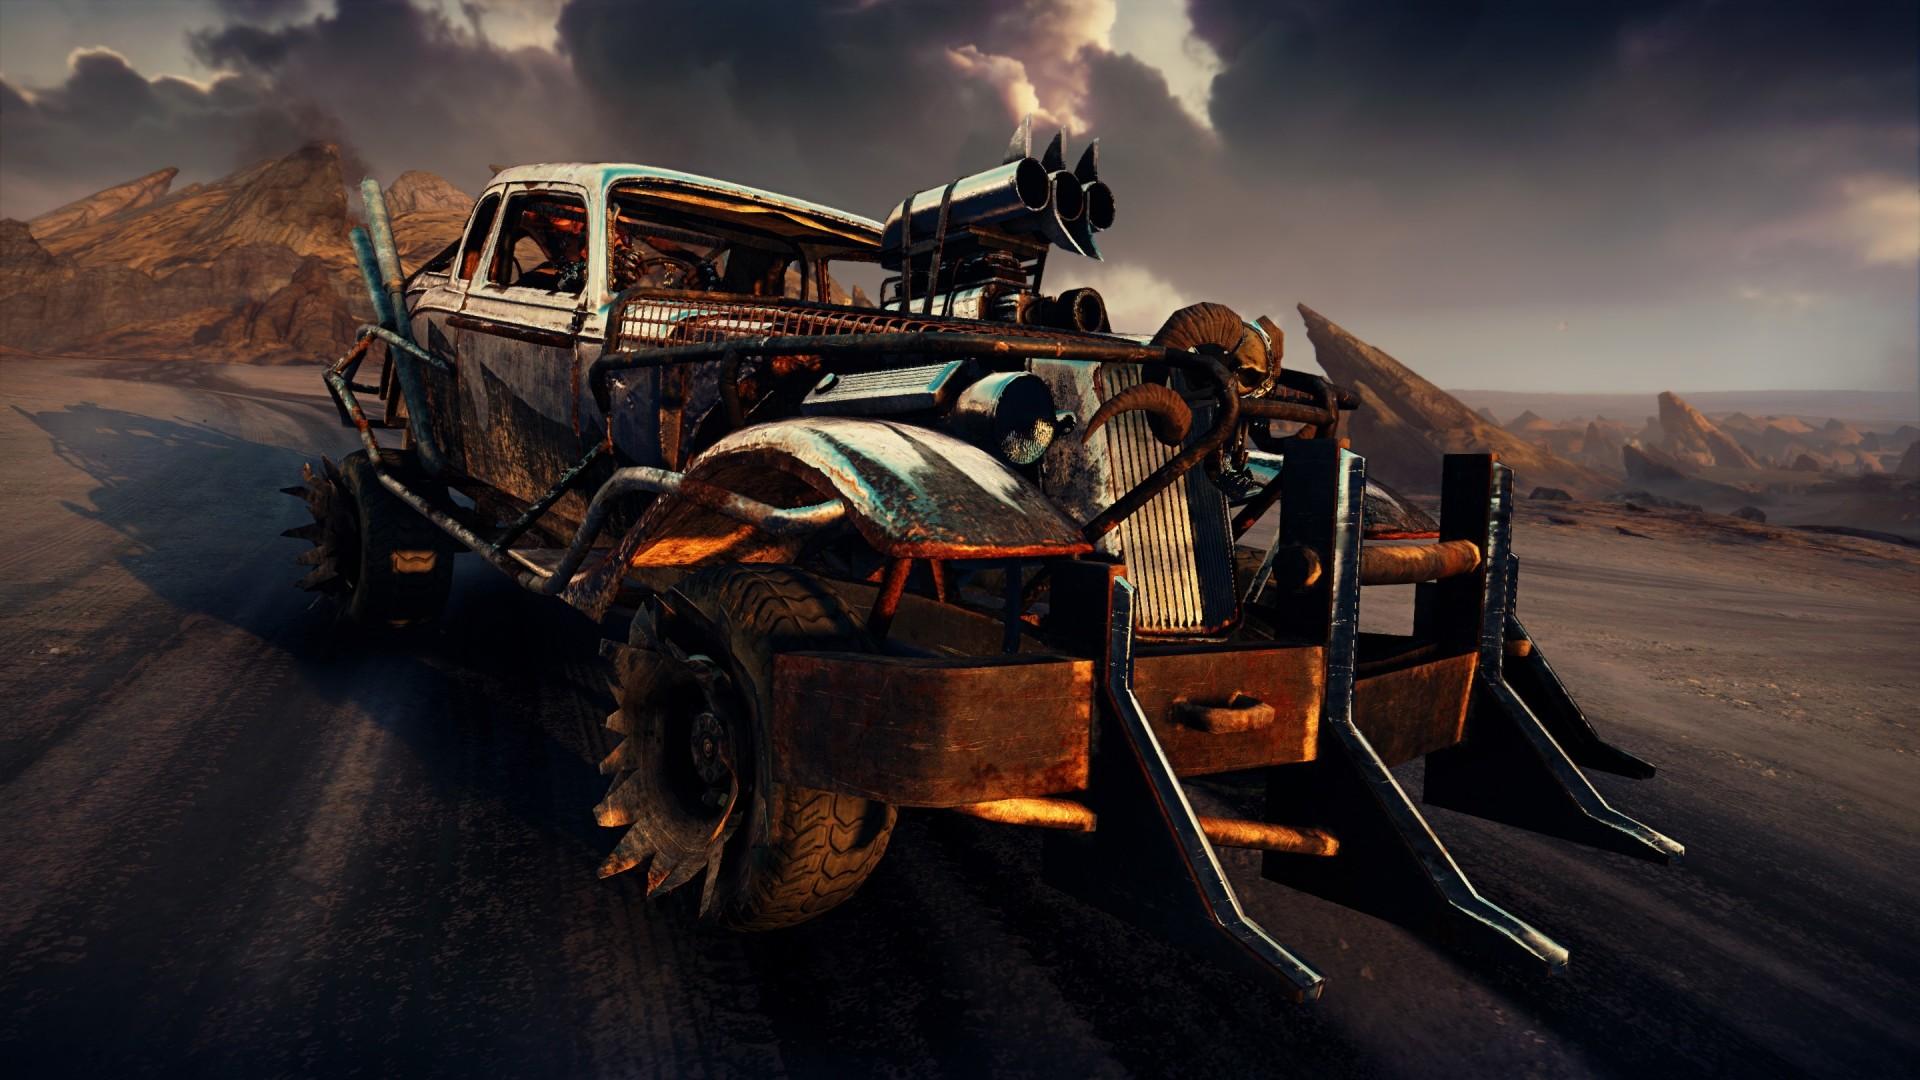 Mad Max HD Wallpaper (67+ images)